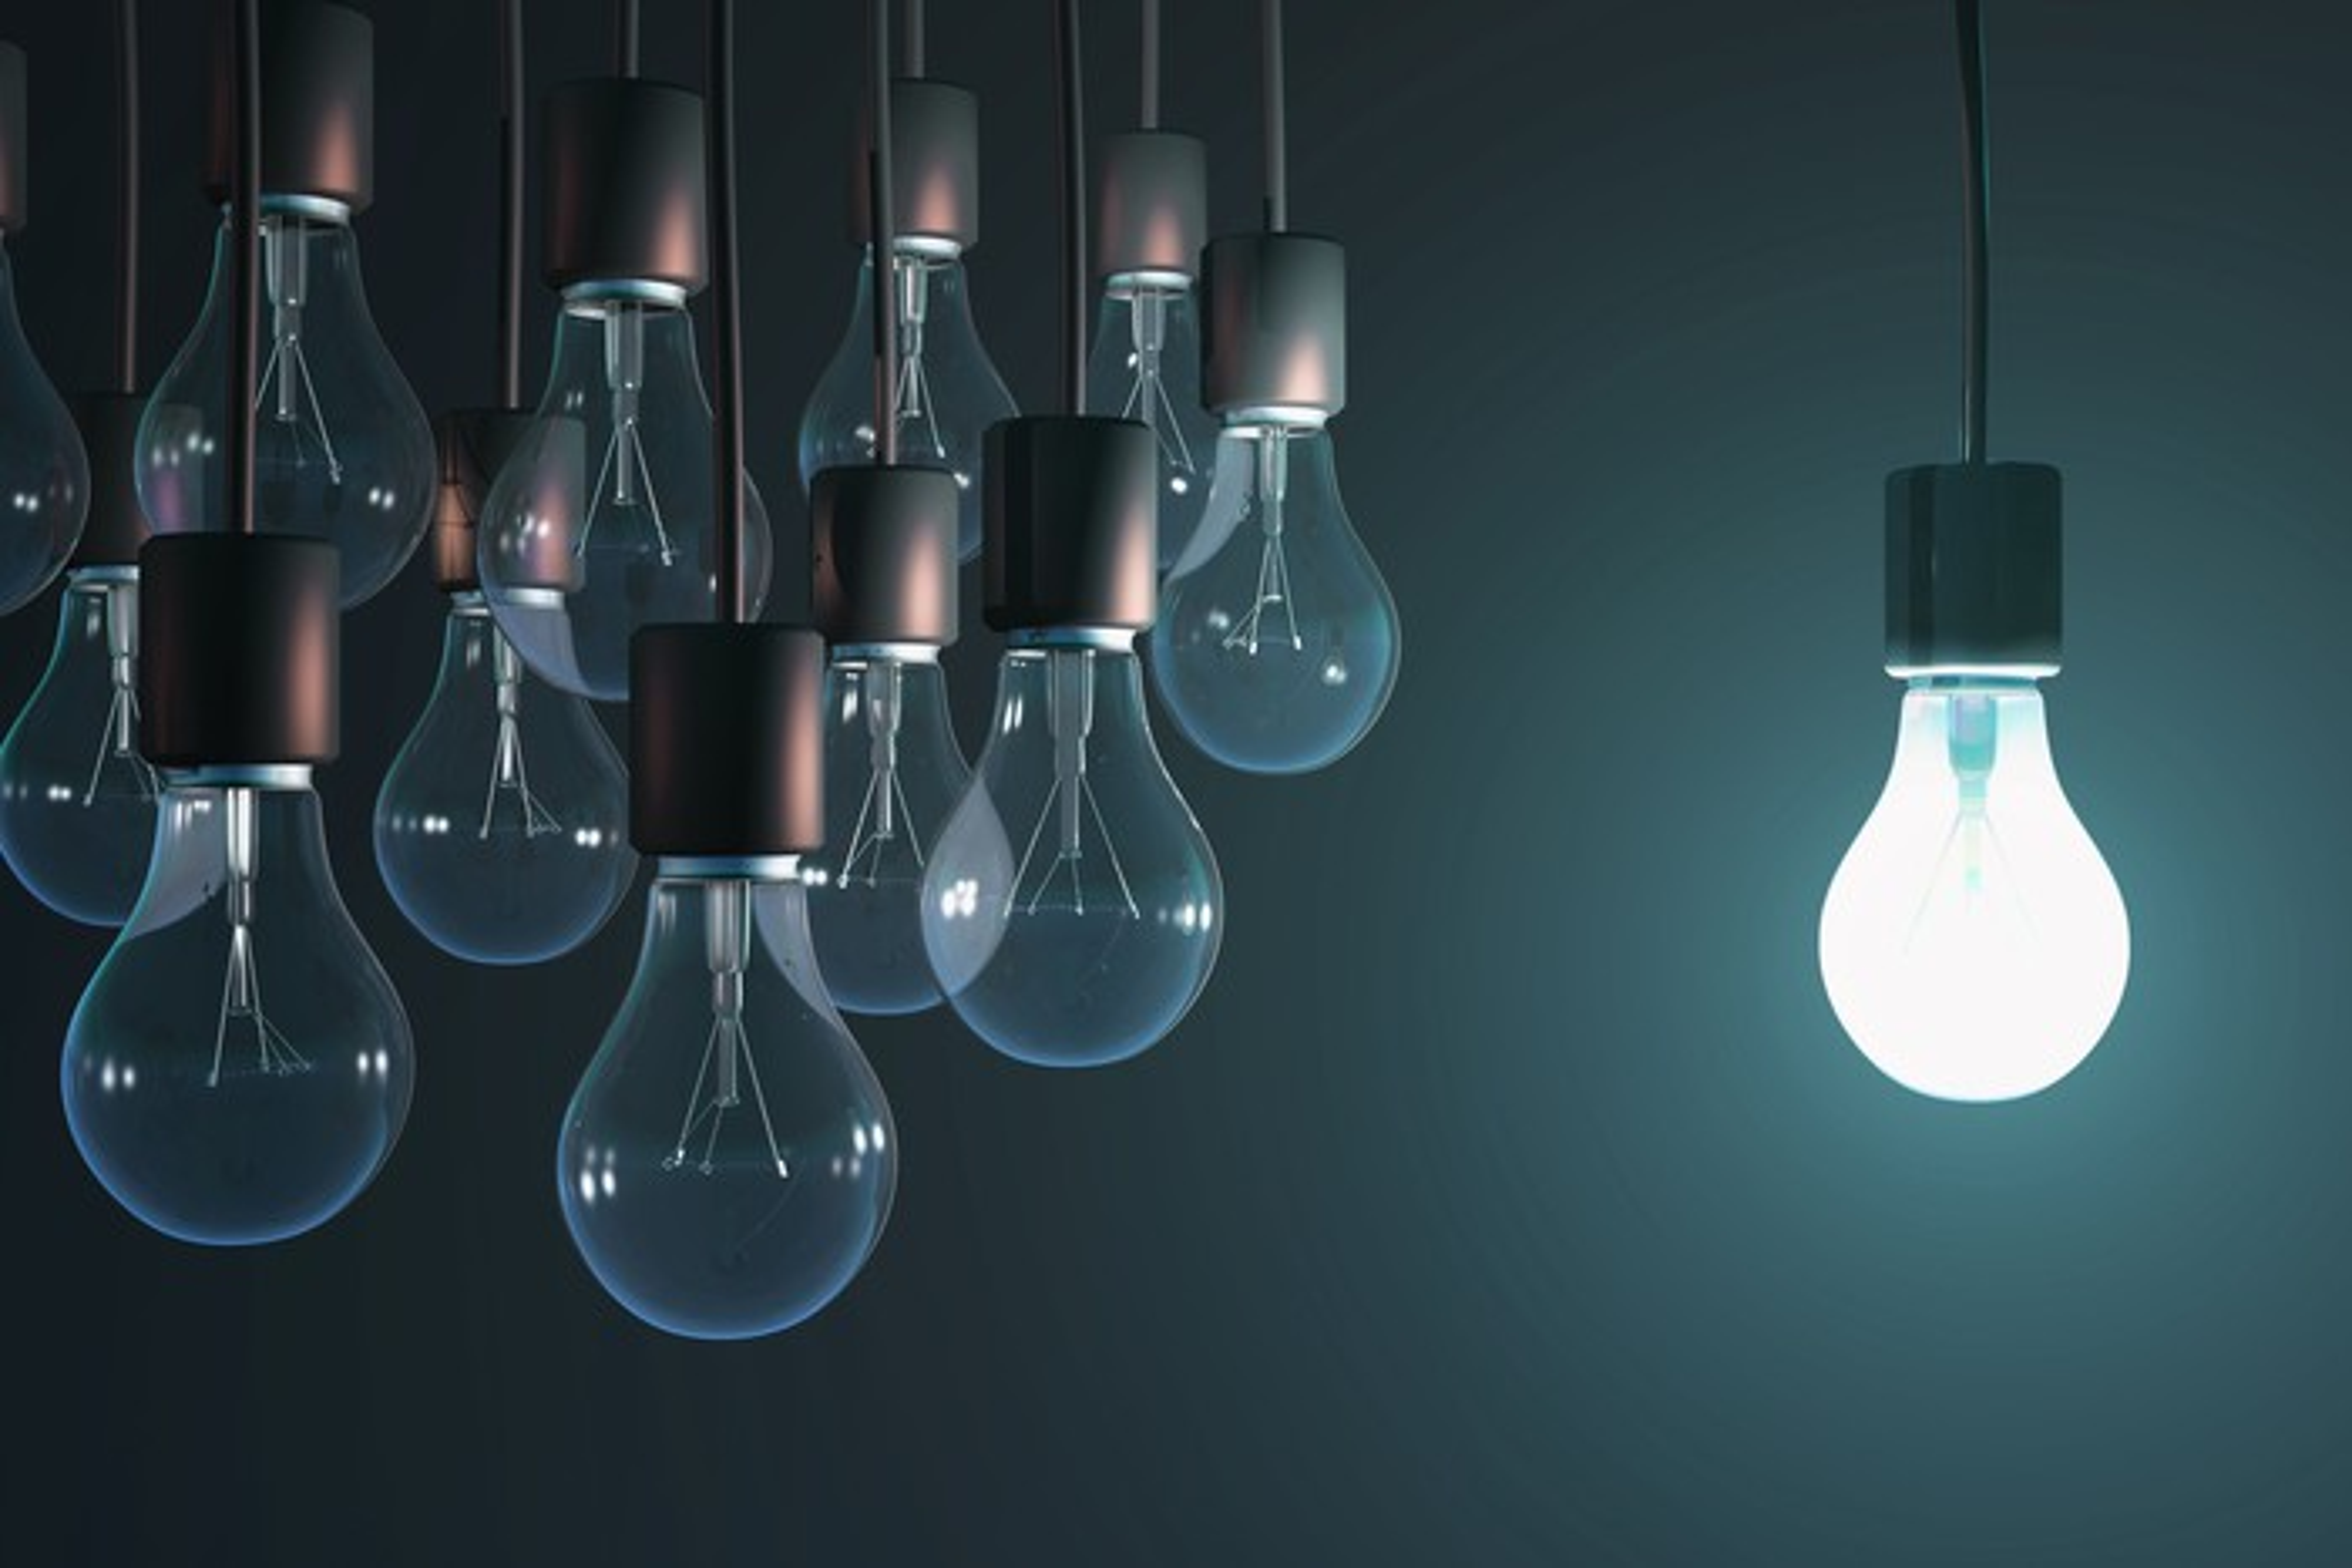 A brightly lit bulb shining near a group of unlit lightbulbs